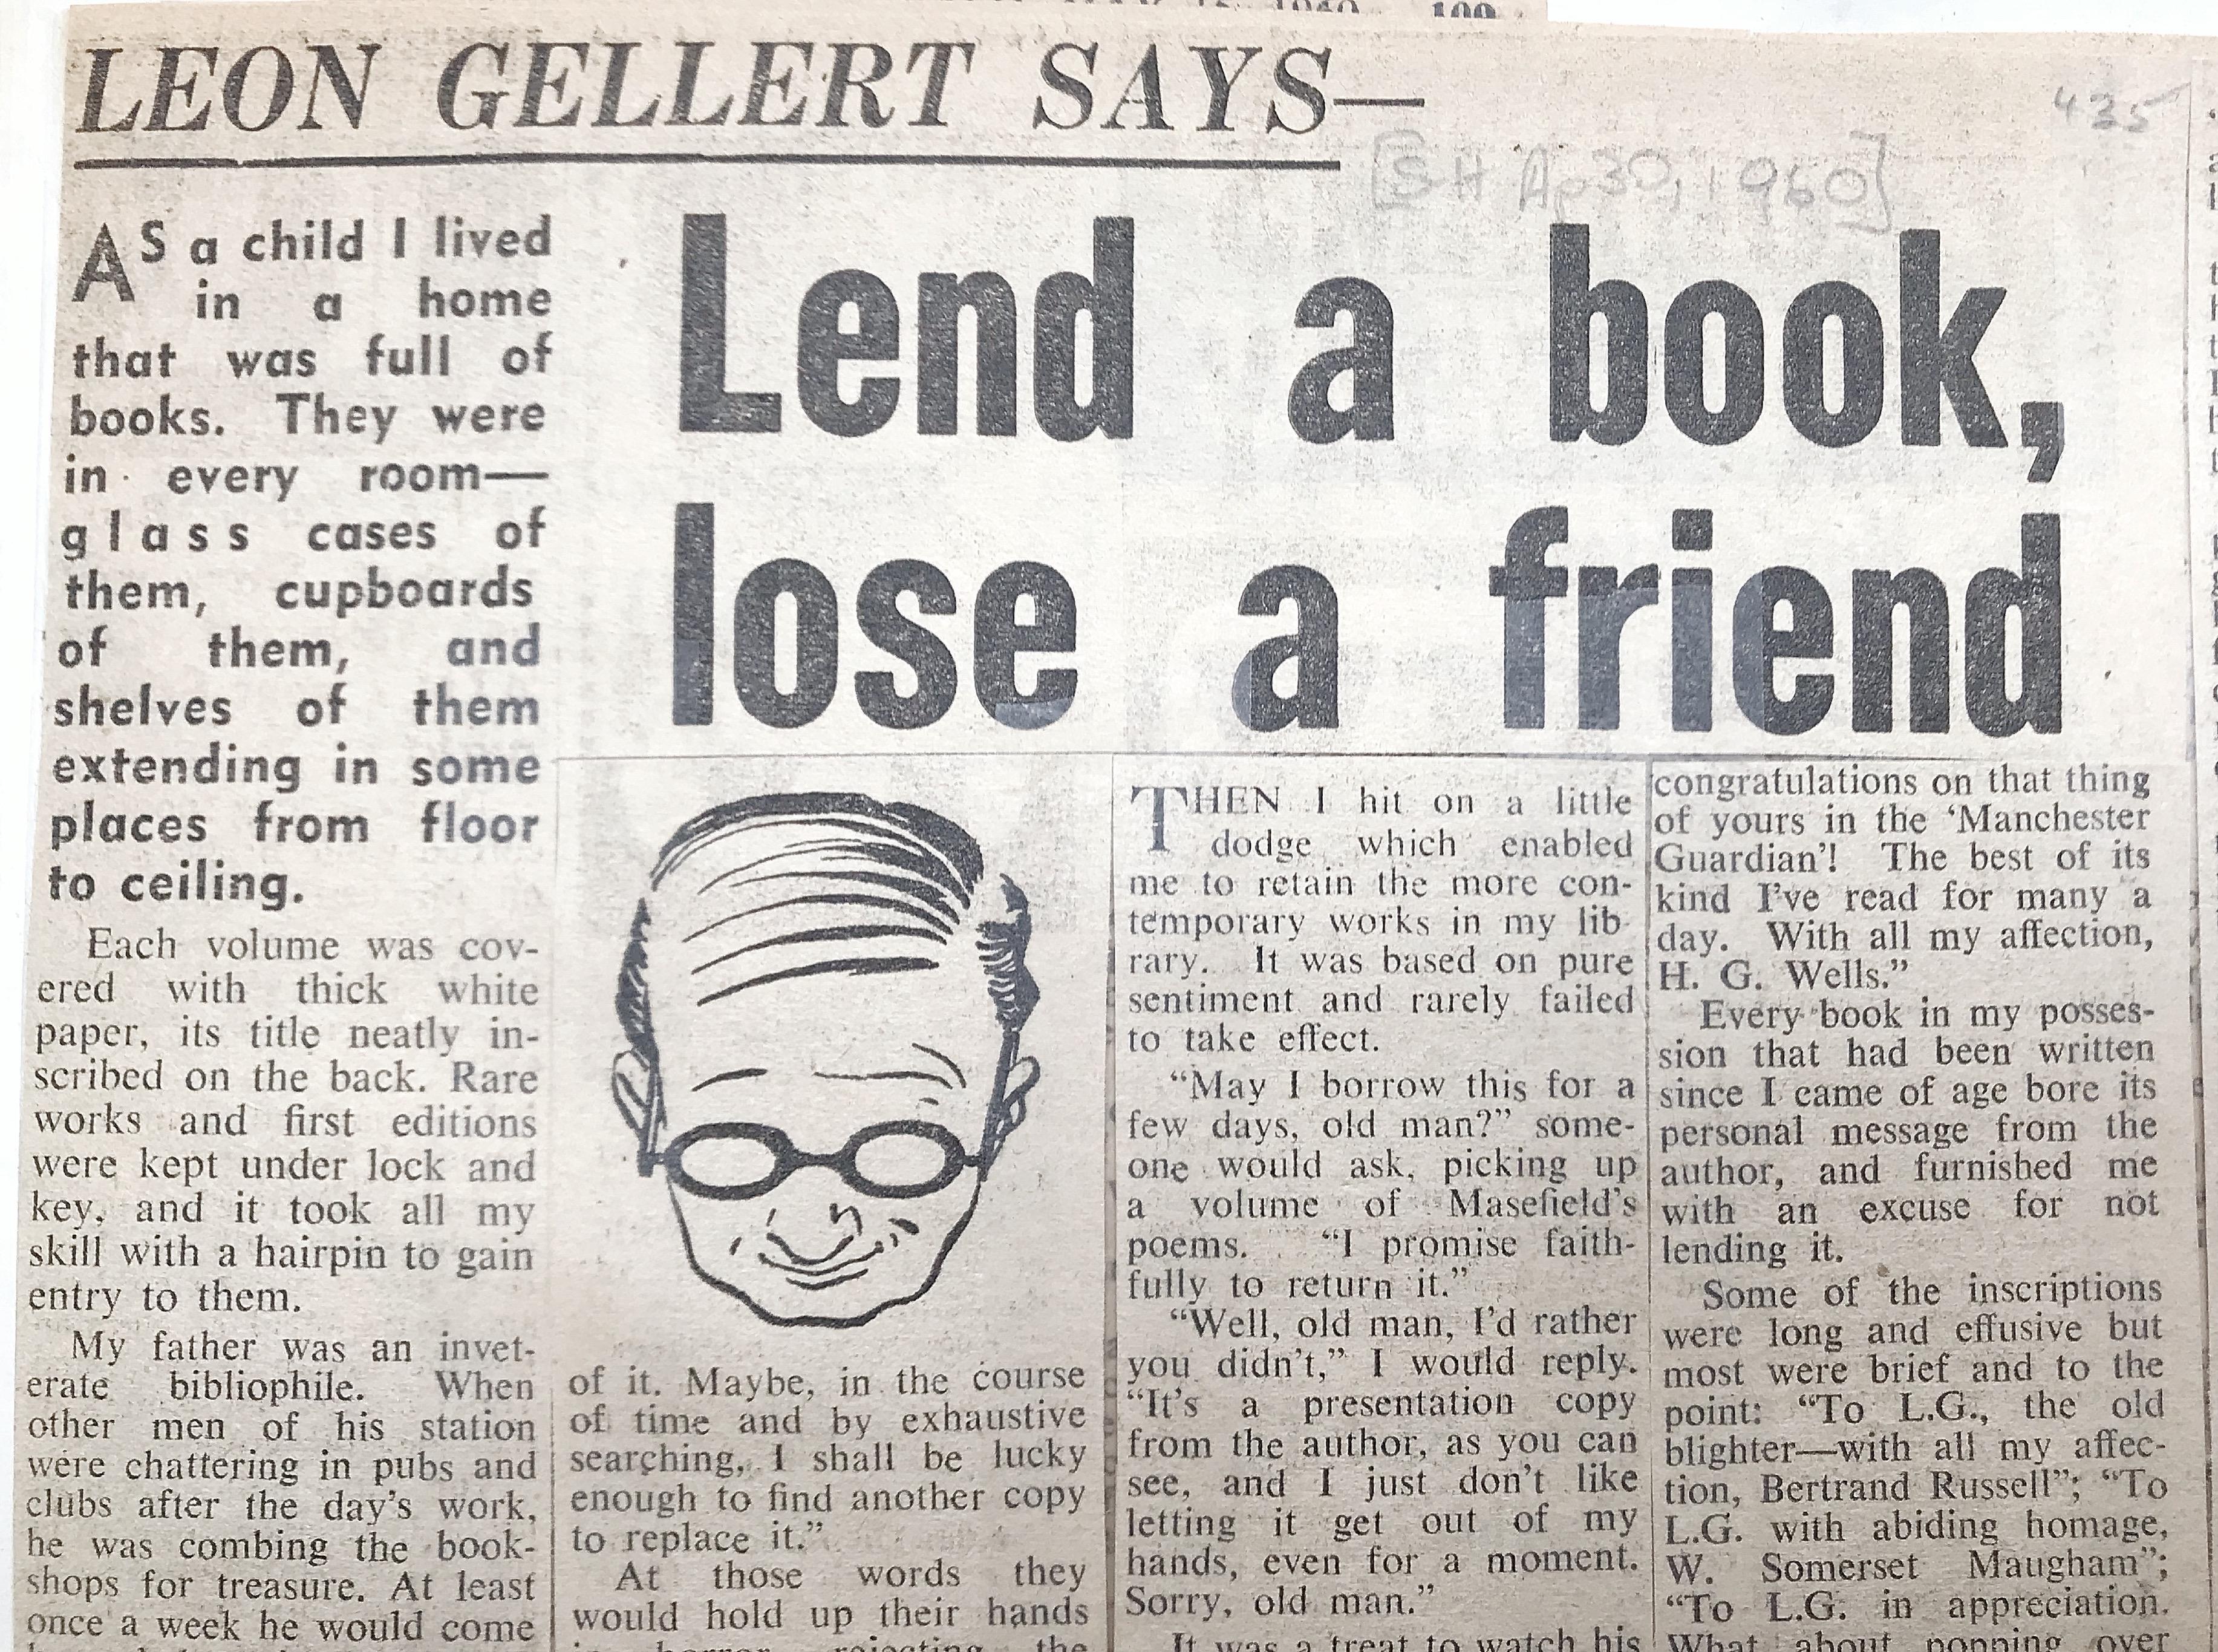 Lend a book